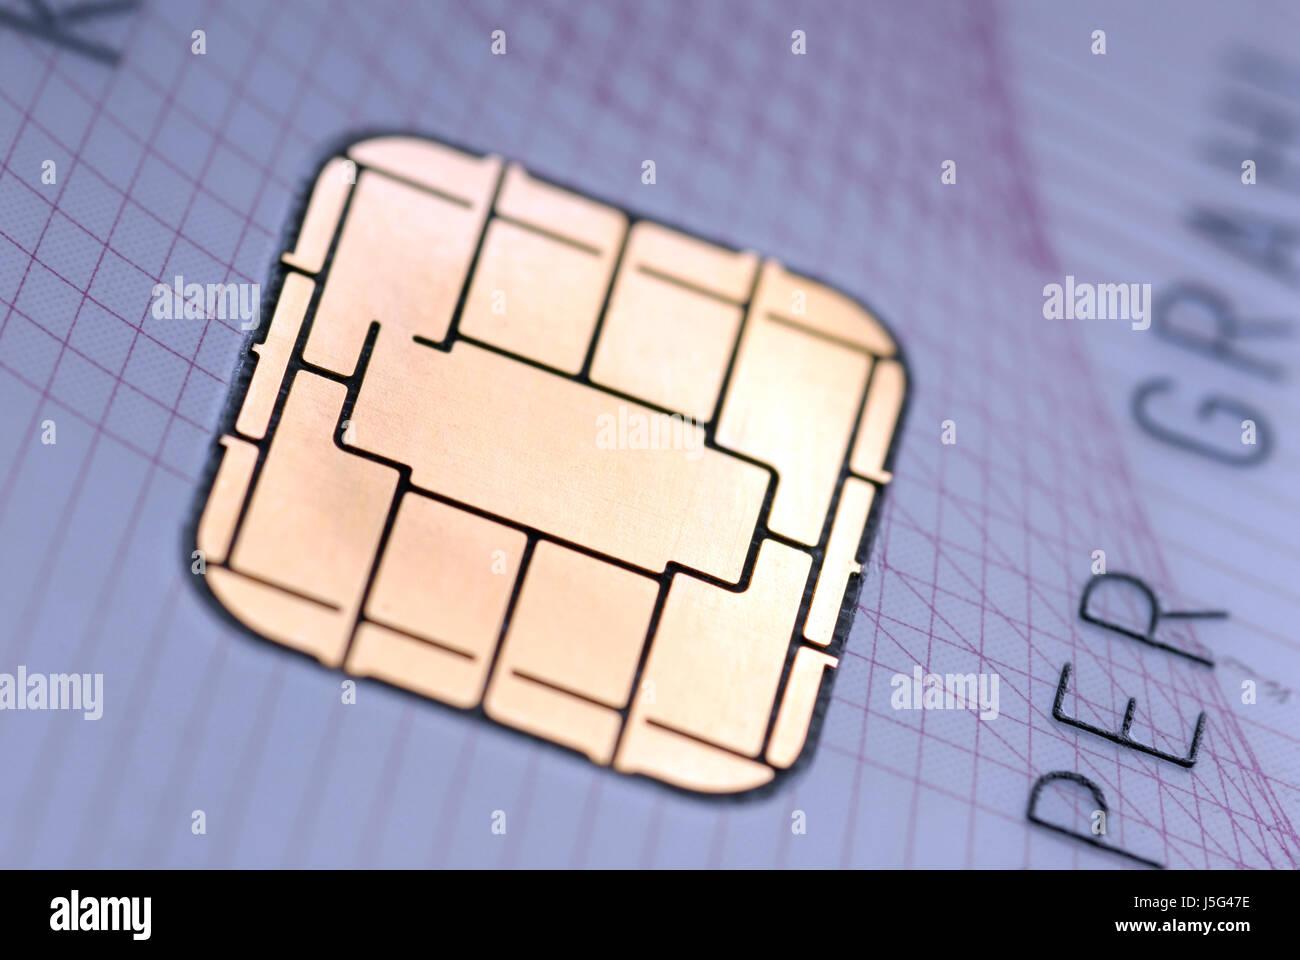 ec card - Stock Image